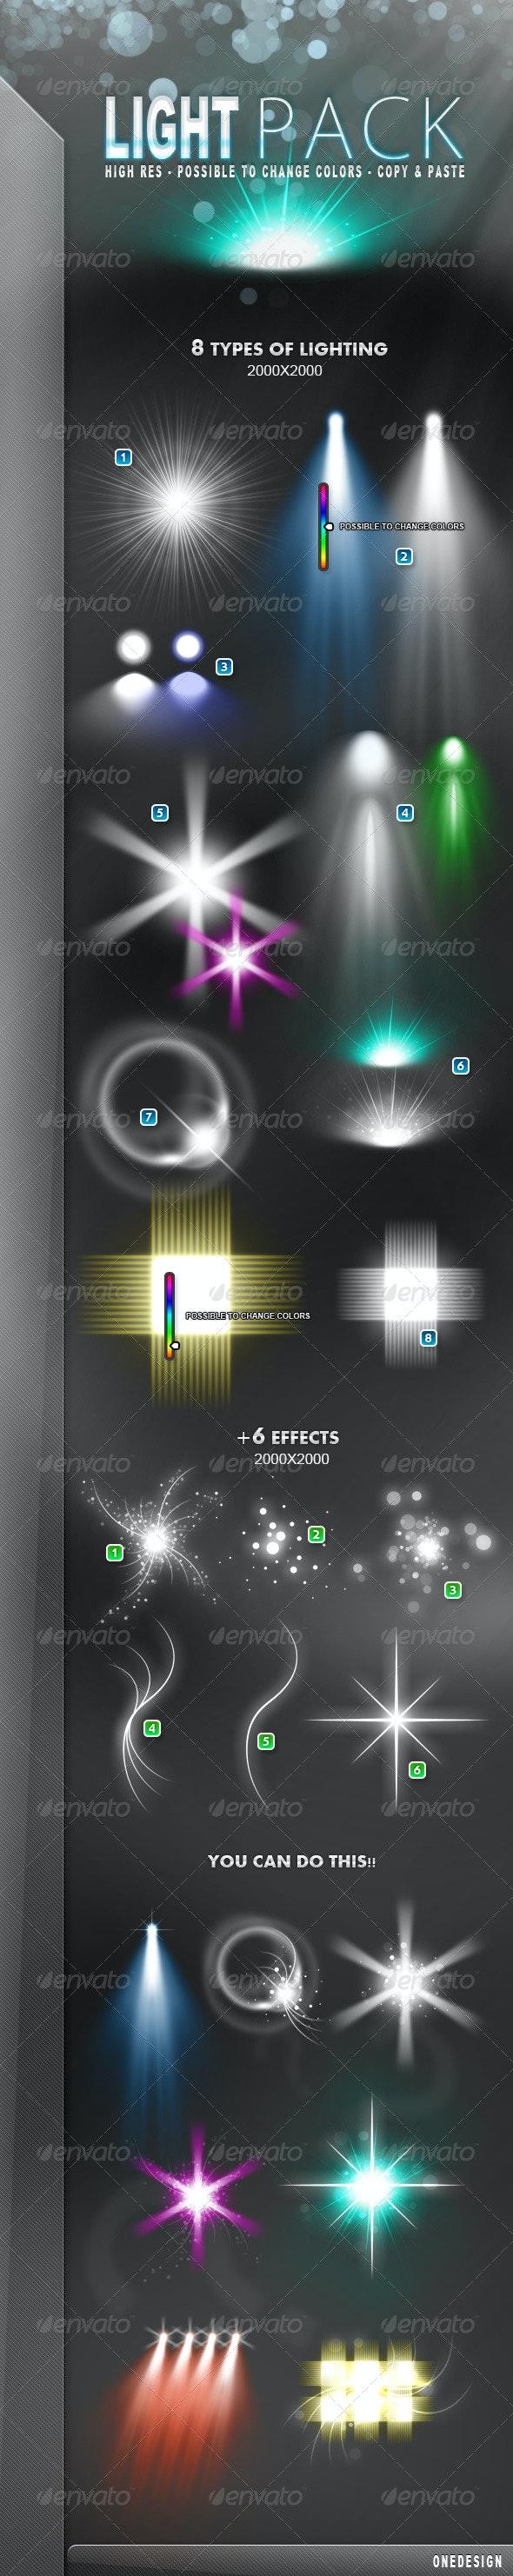 Light Pack - Decorative Graphics